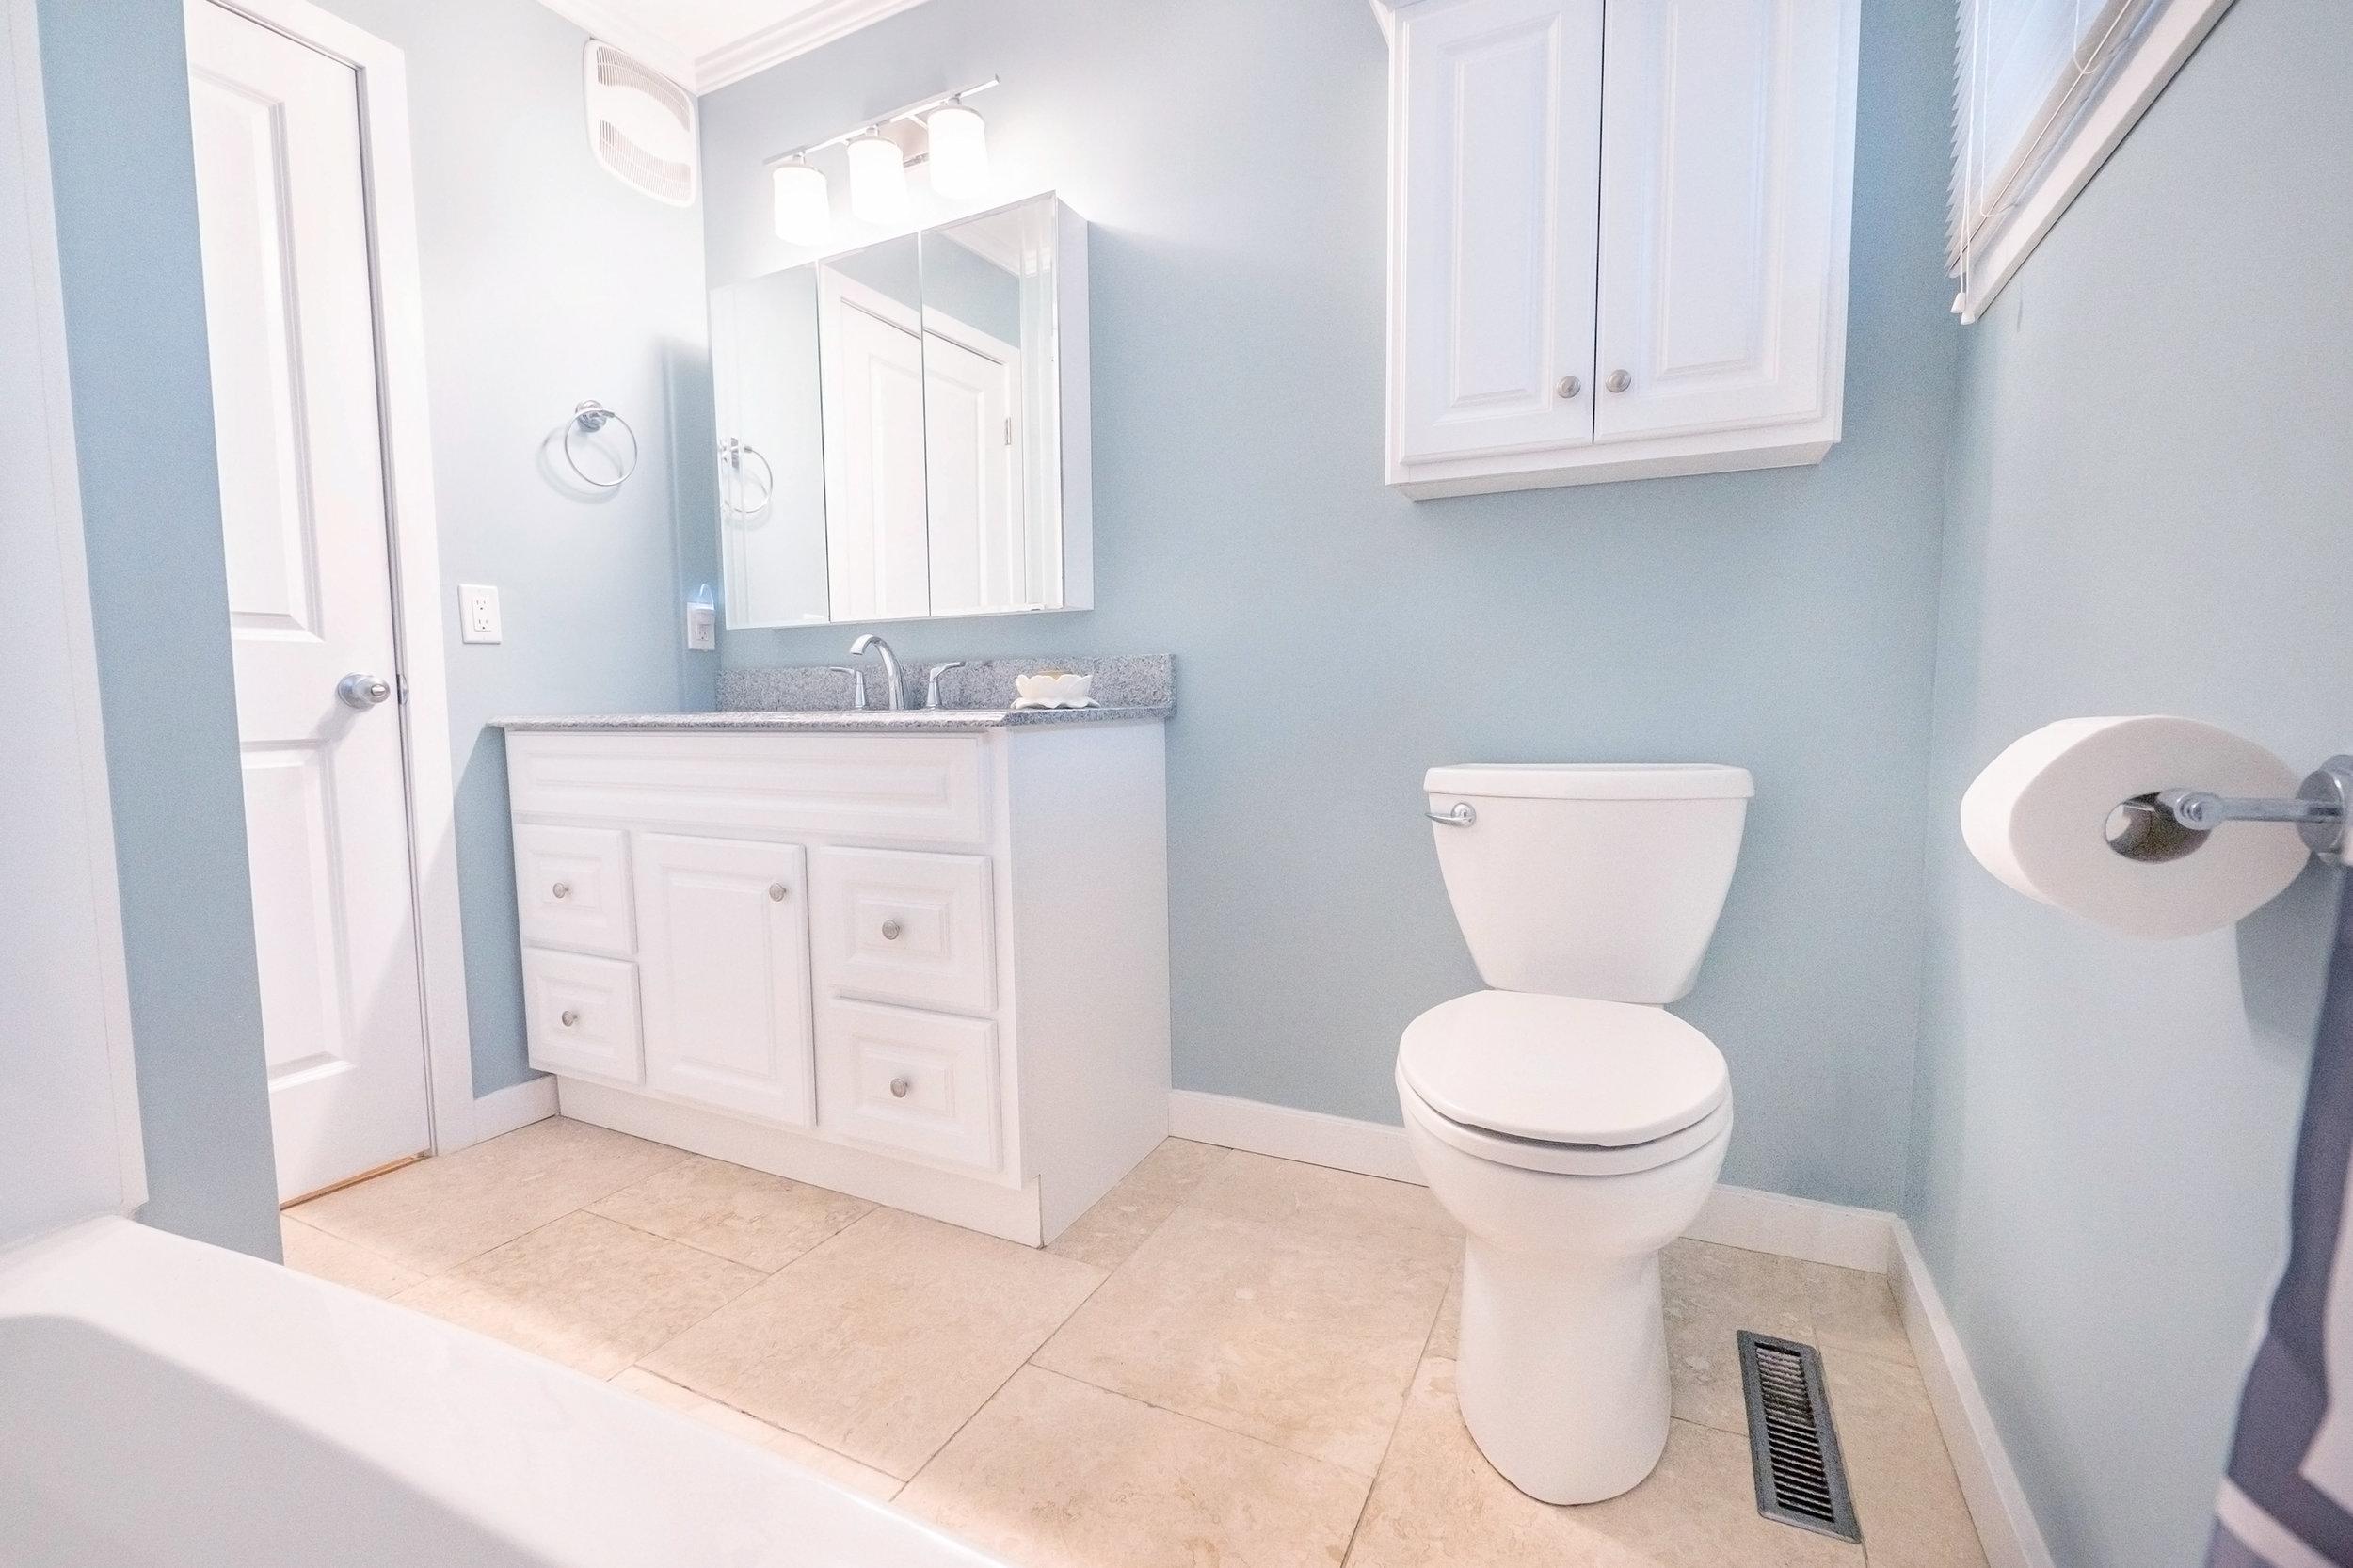 92 Hammond Bathroom.jpg